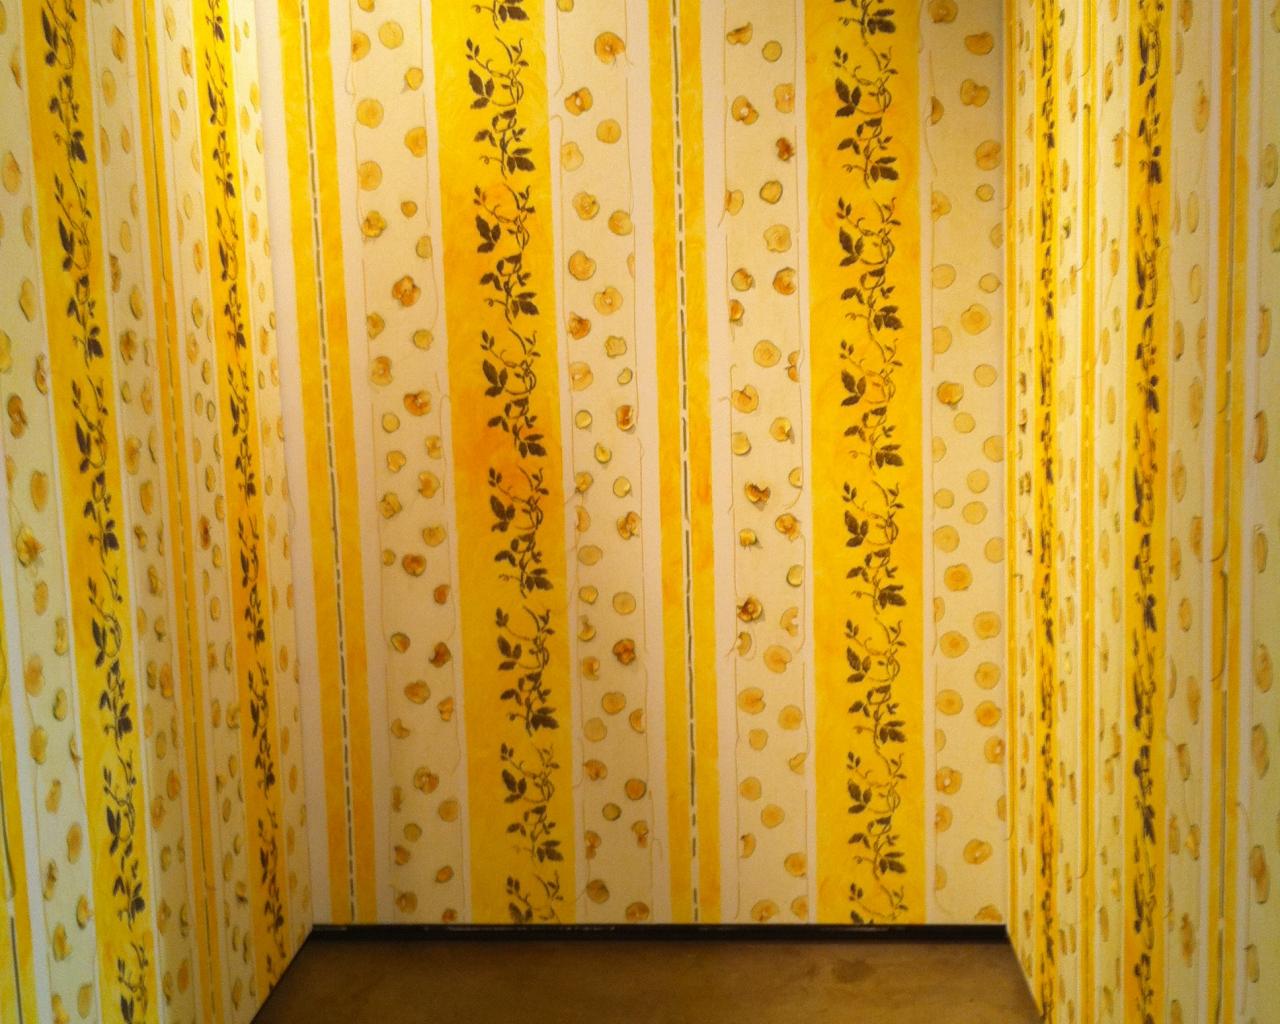 Free Download Essay On The Yellow Wallpaper Symbolism Amanda Jimeno 1936x2592 For Your Desktop Mobile Tablet Explore 50 Symbolism In The Yellow Wallpaper By Gilman The Yellow Wallpaper Symbolism